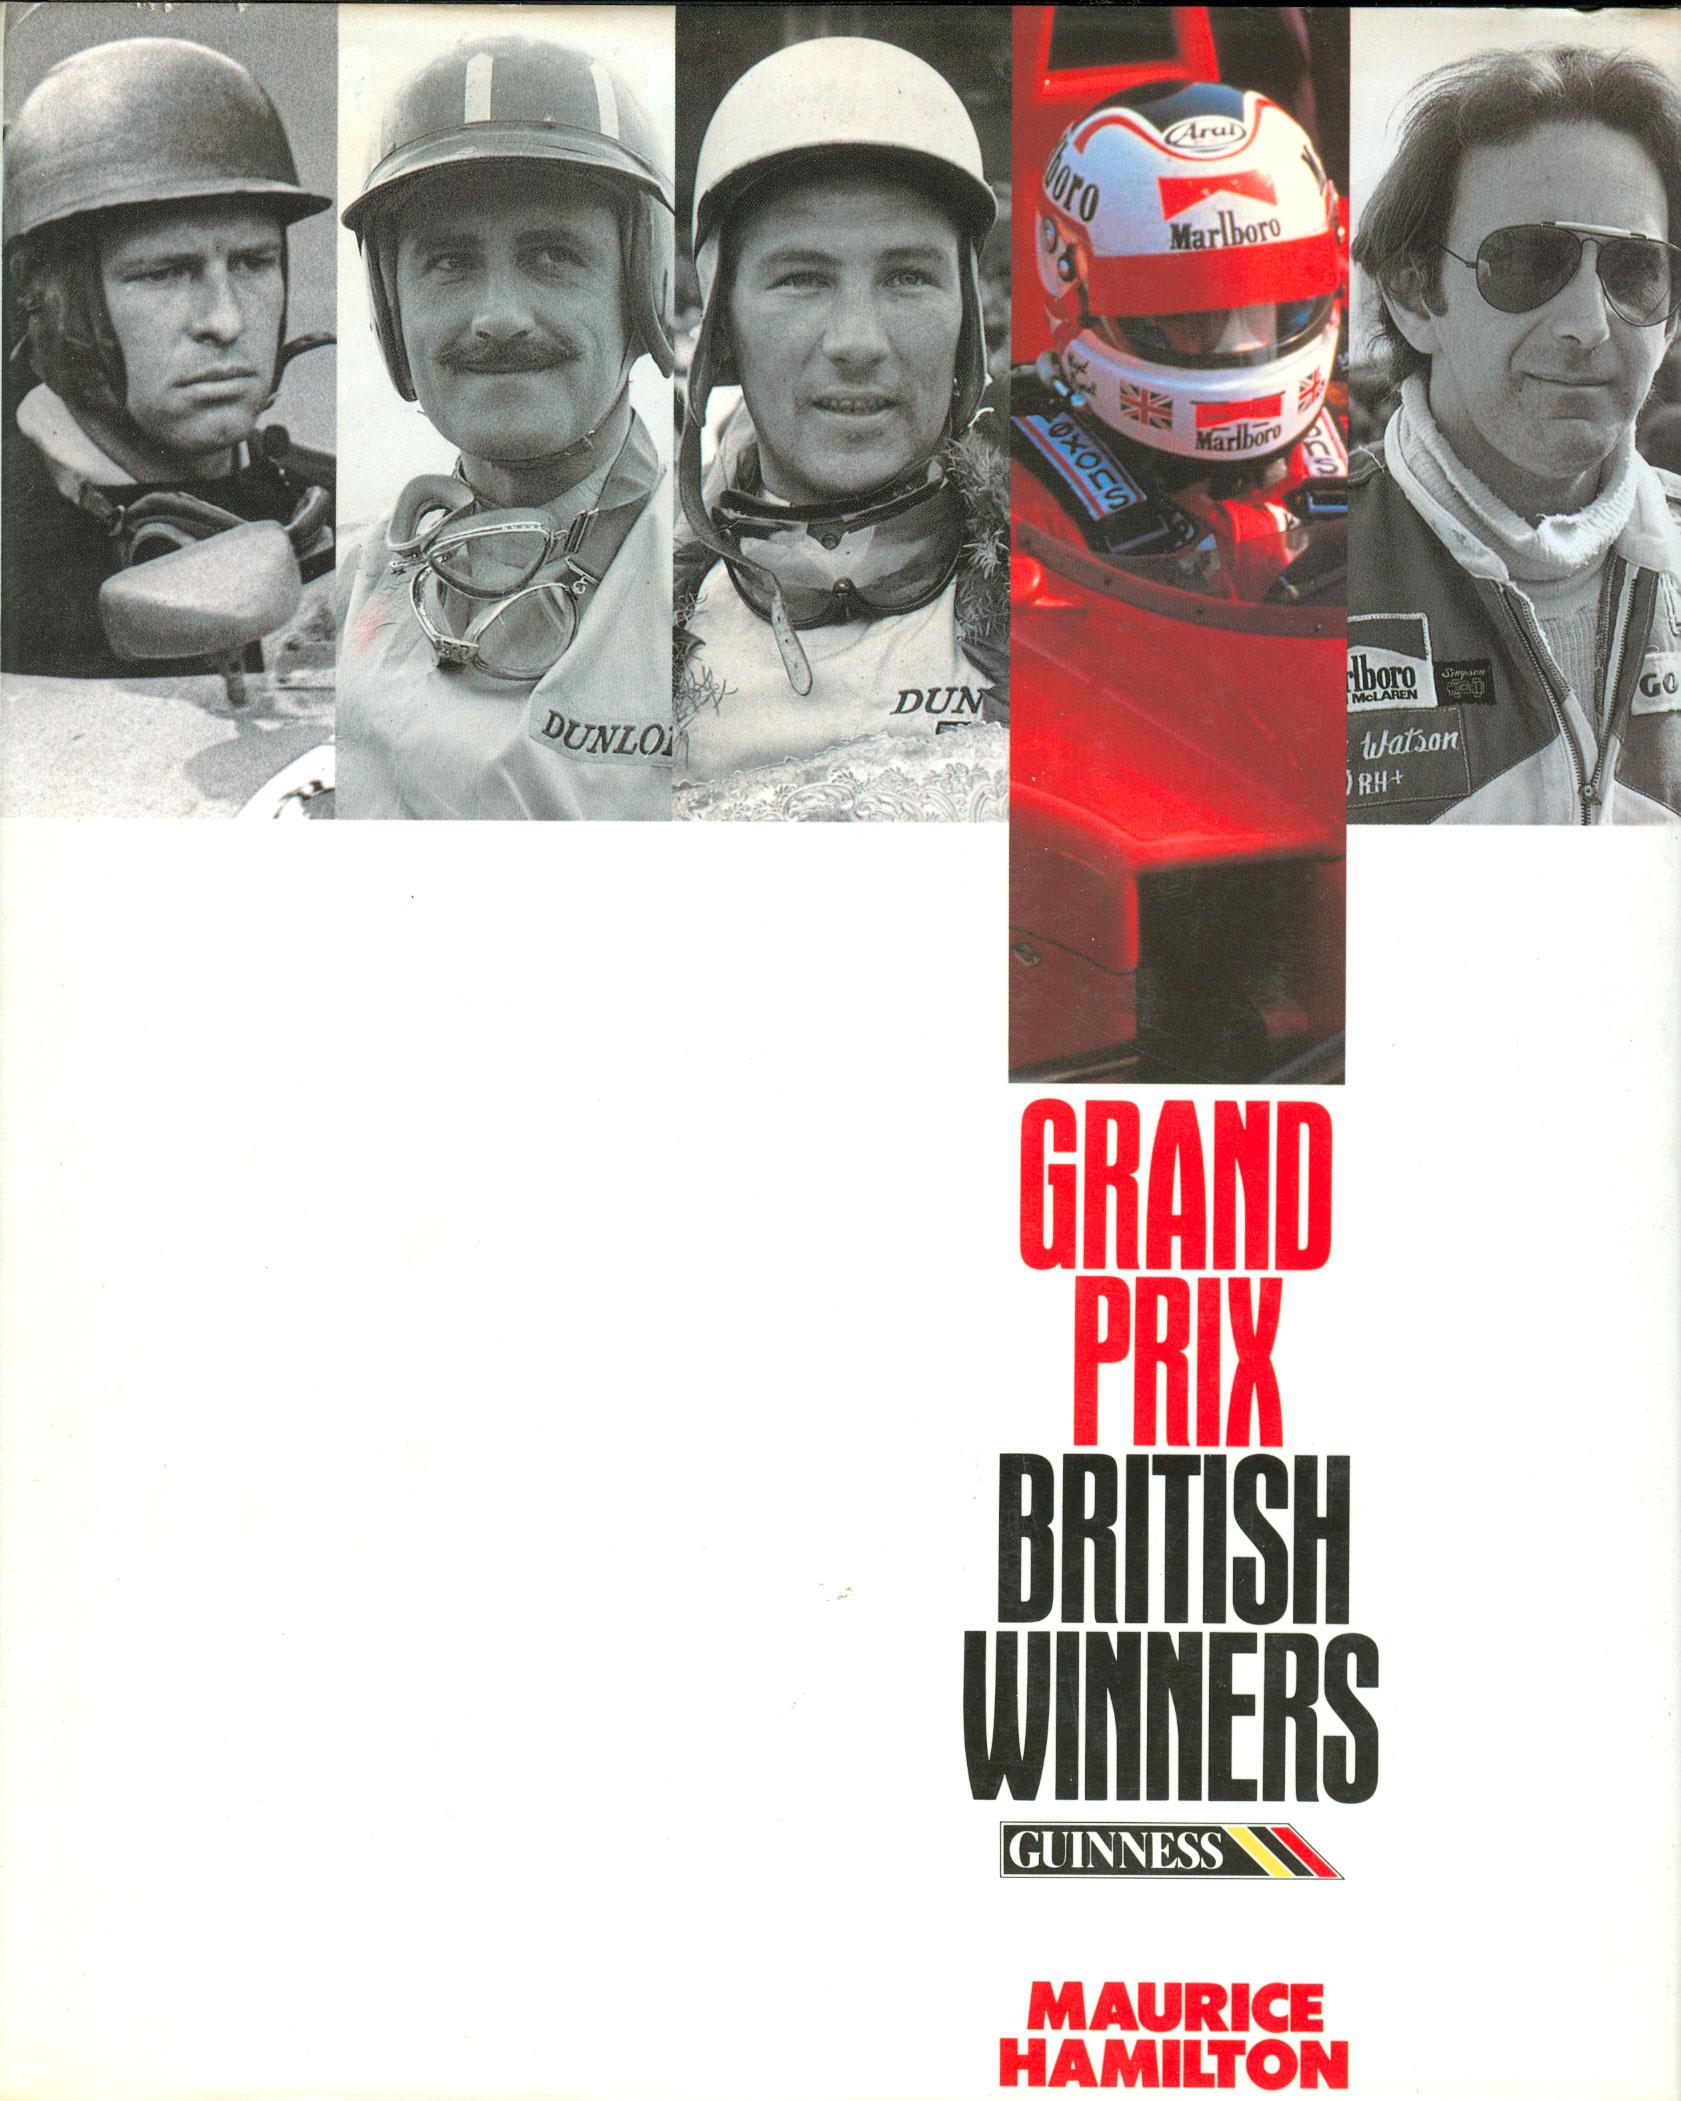 Grand Prix British Winners